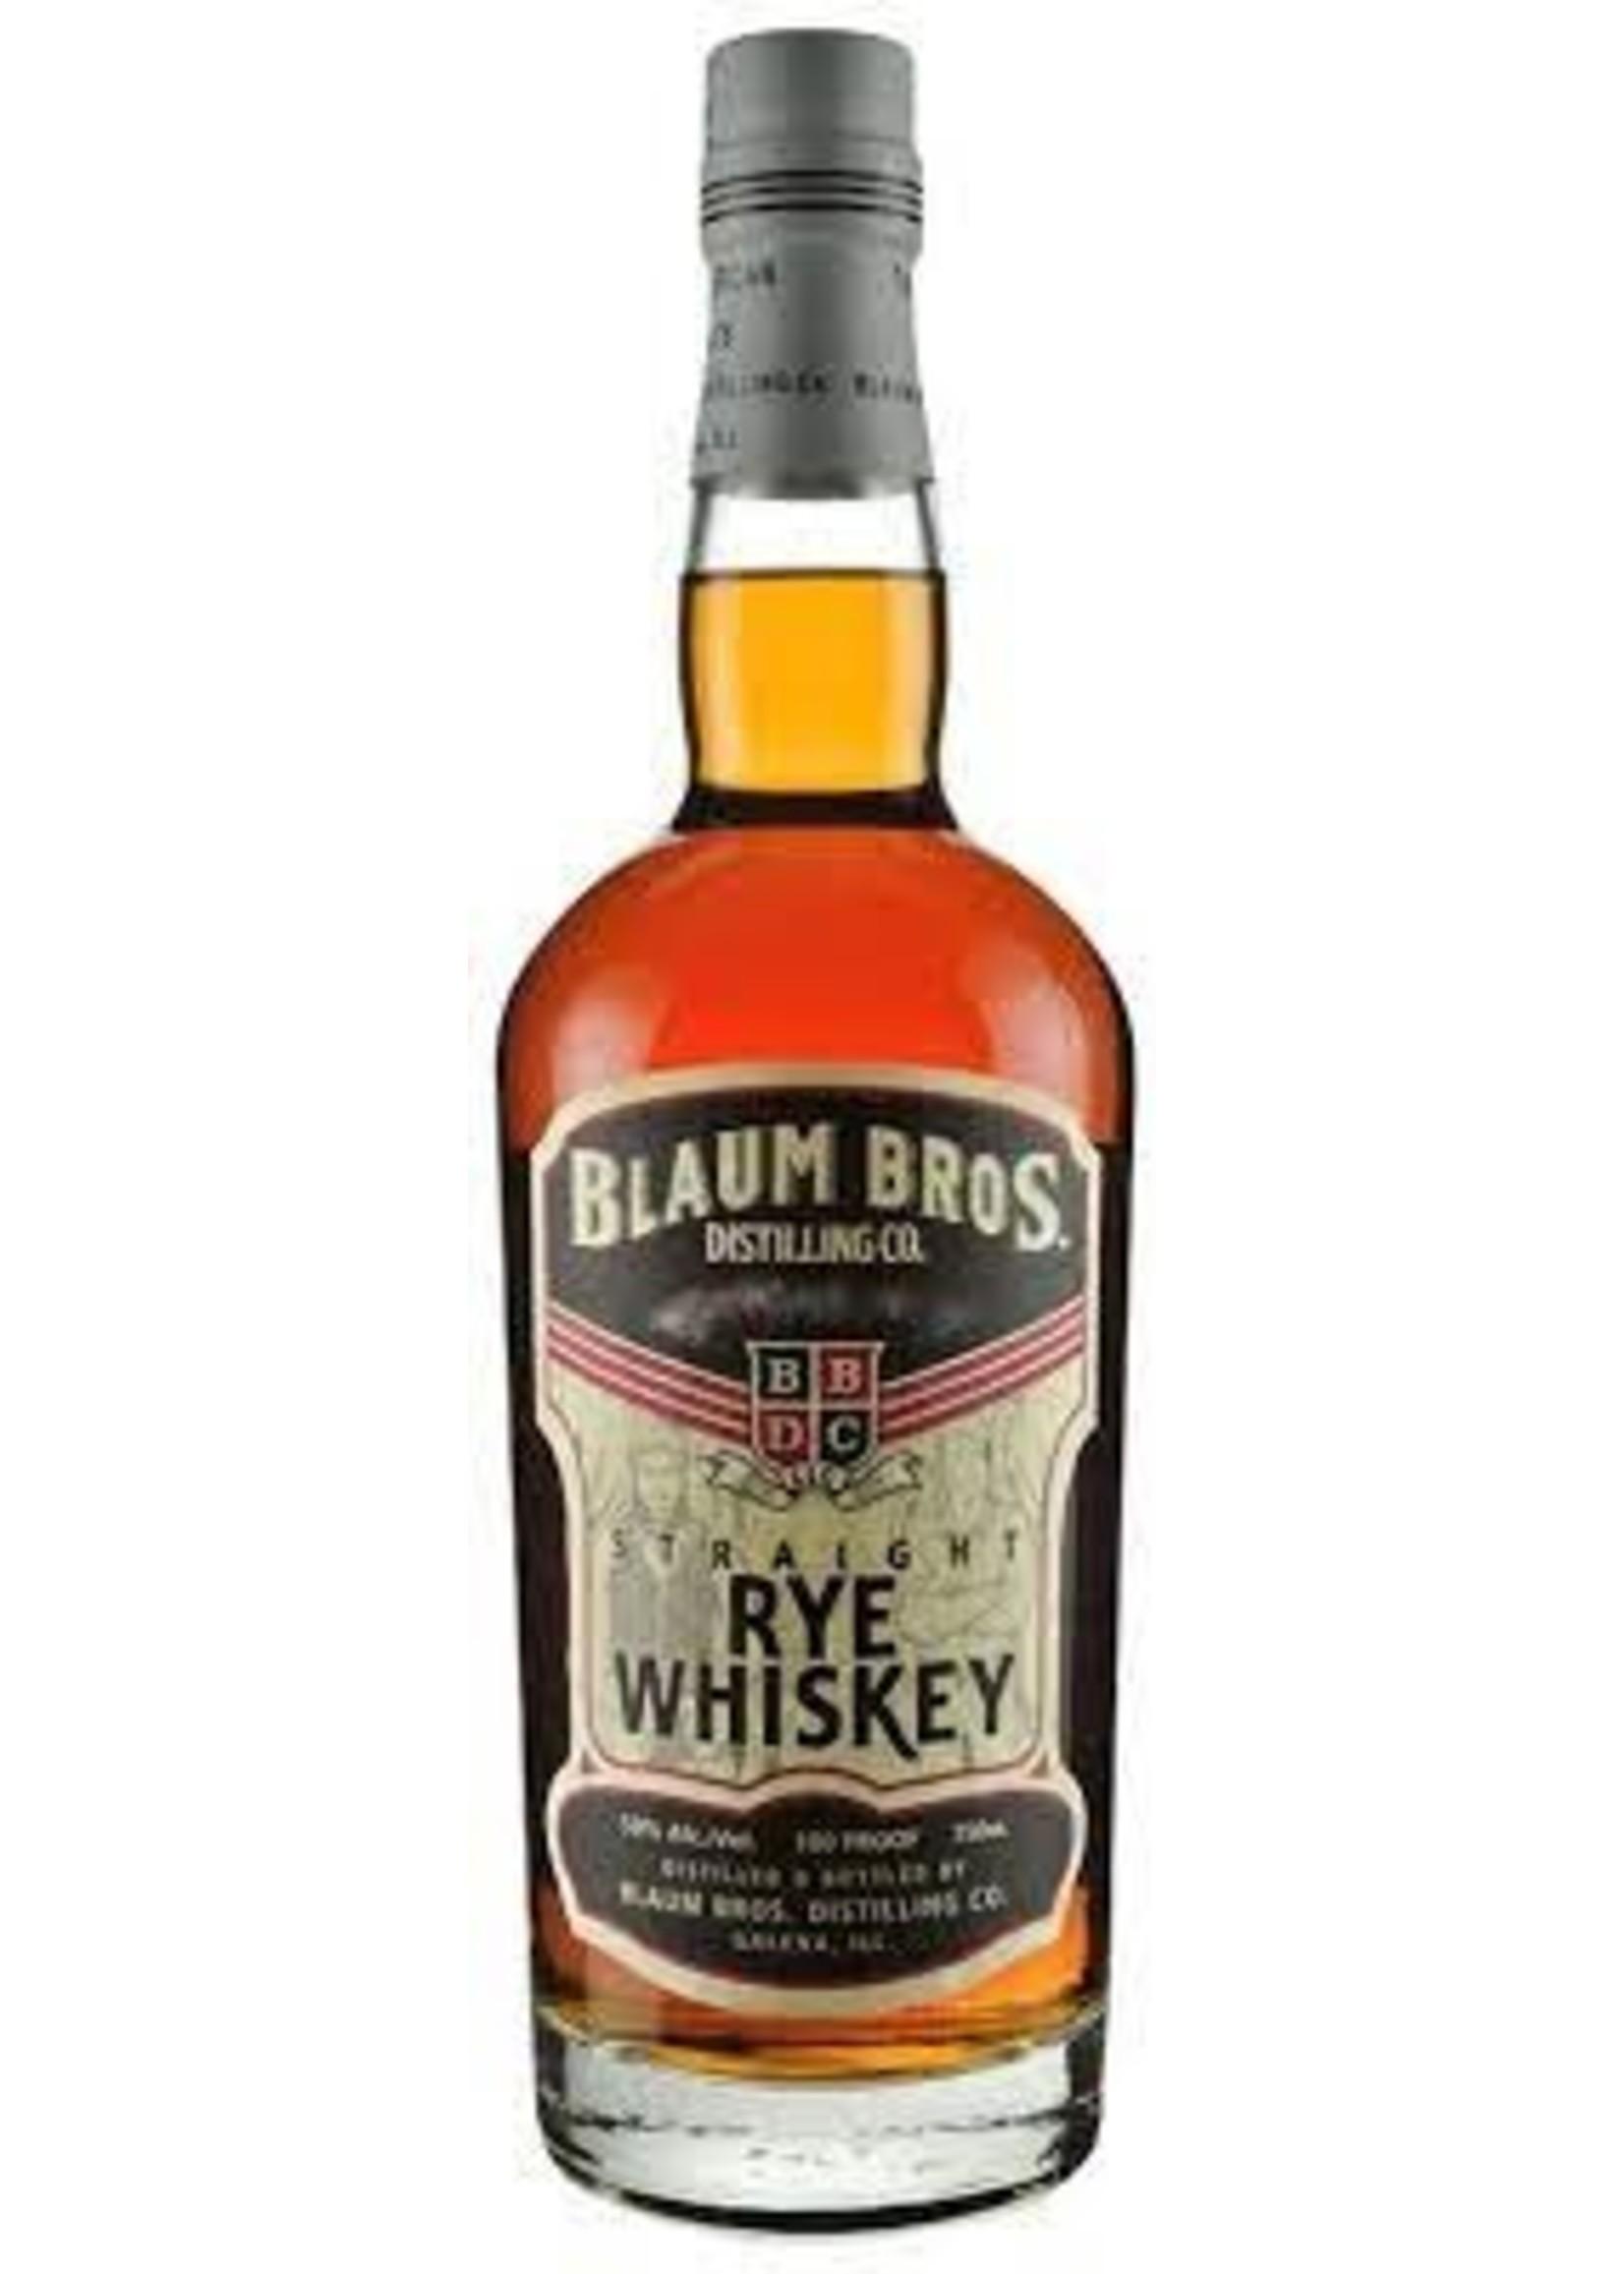 Blaum Bros Straight Rye Whiskey 750ml